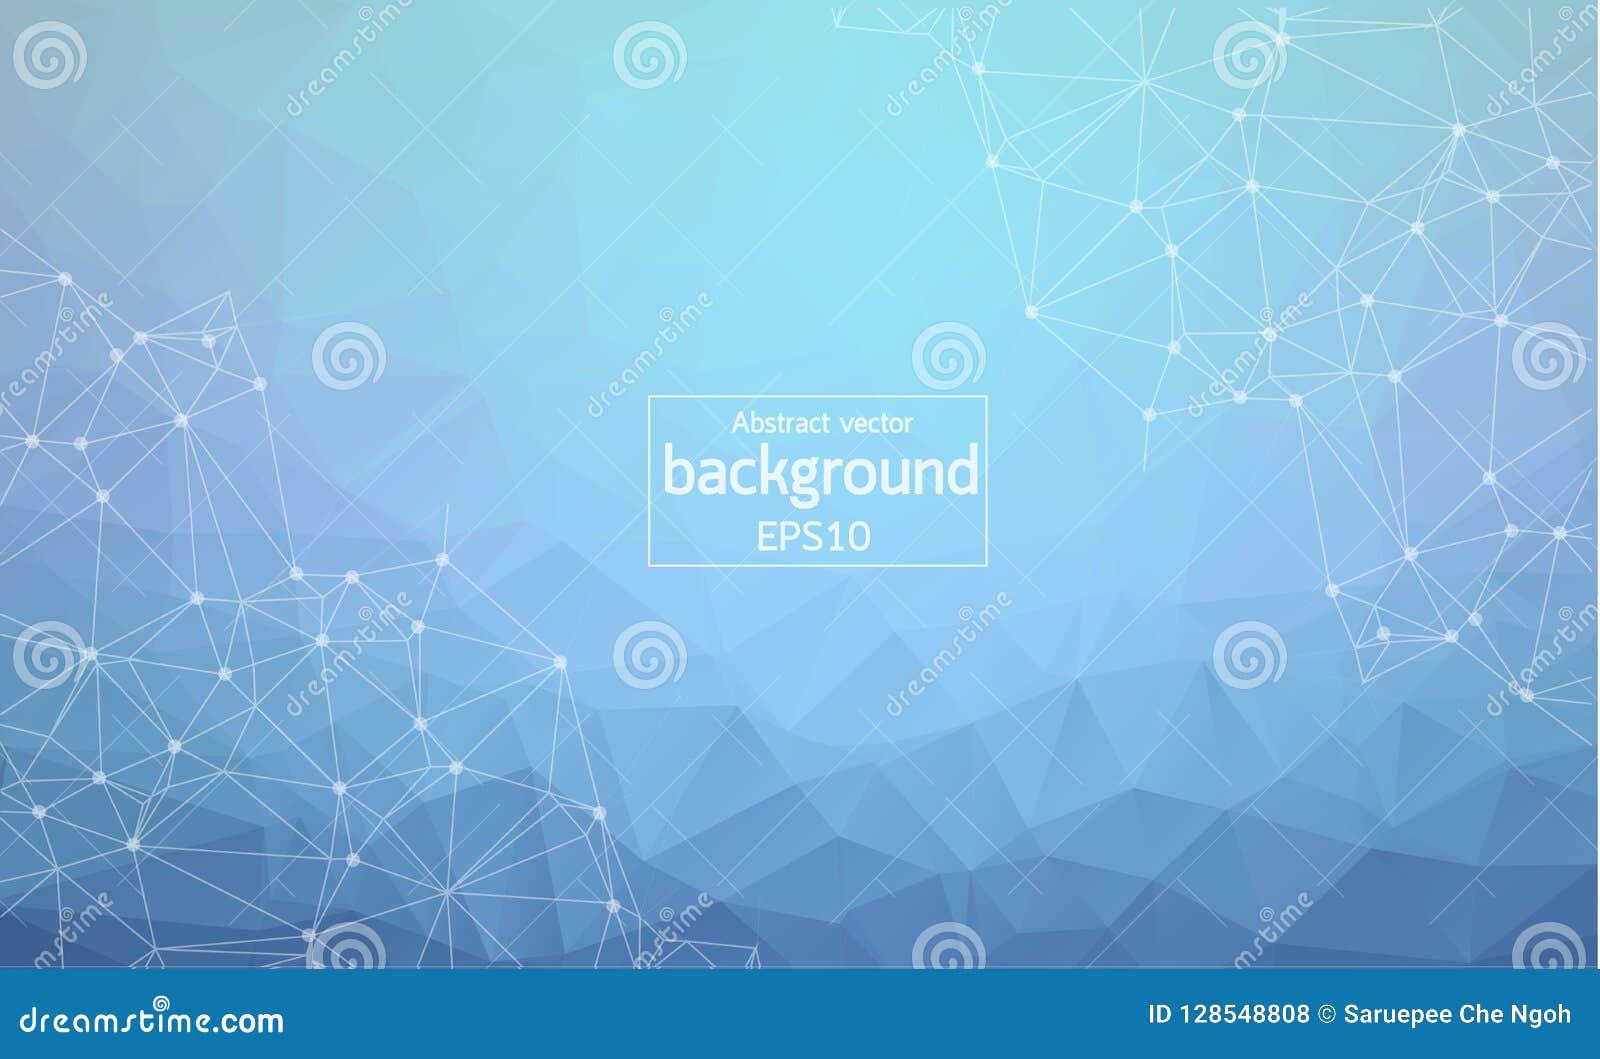 professional presentation background images